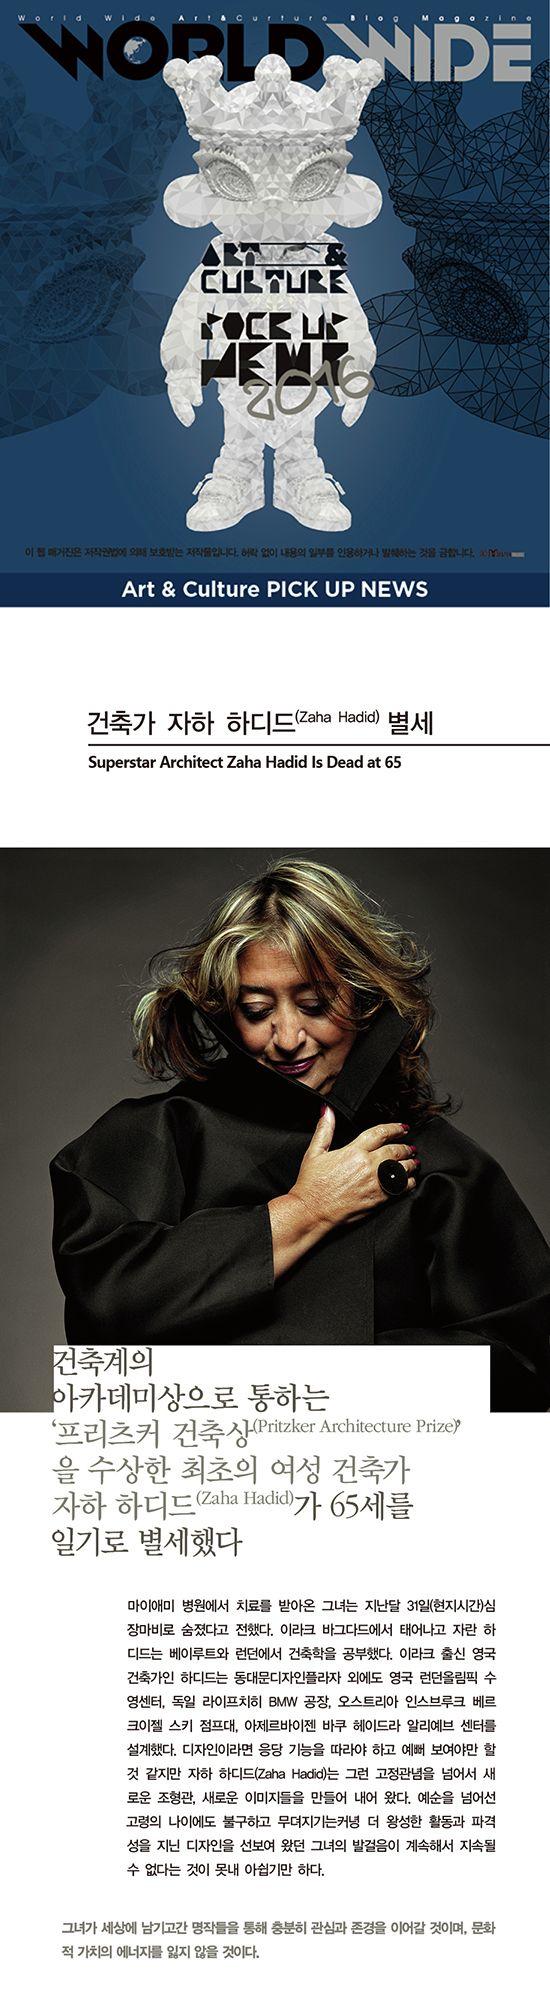 Blog Magazine ● WORLD WIDE: Art & Culture PICK UP NEWS∥건축가 자하 하디드(Zaha Hadid)별세